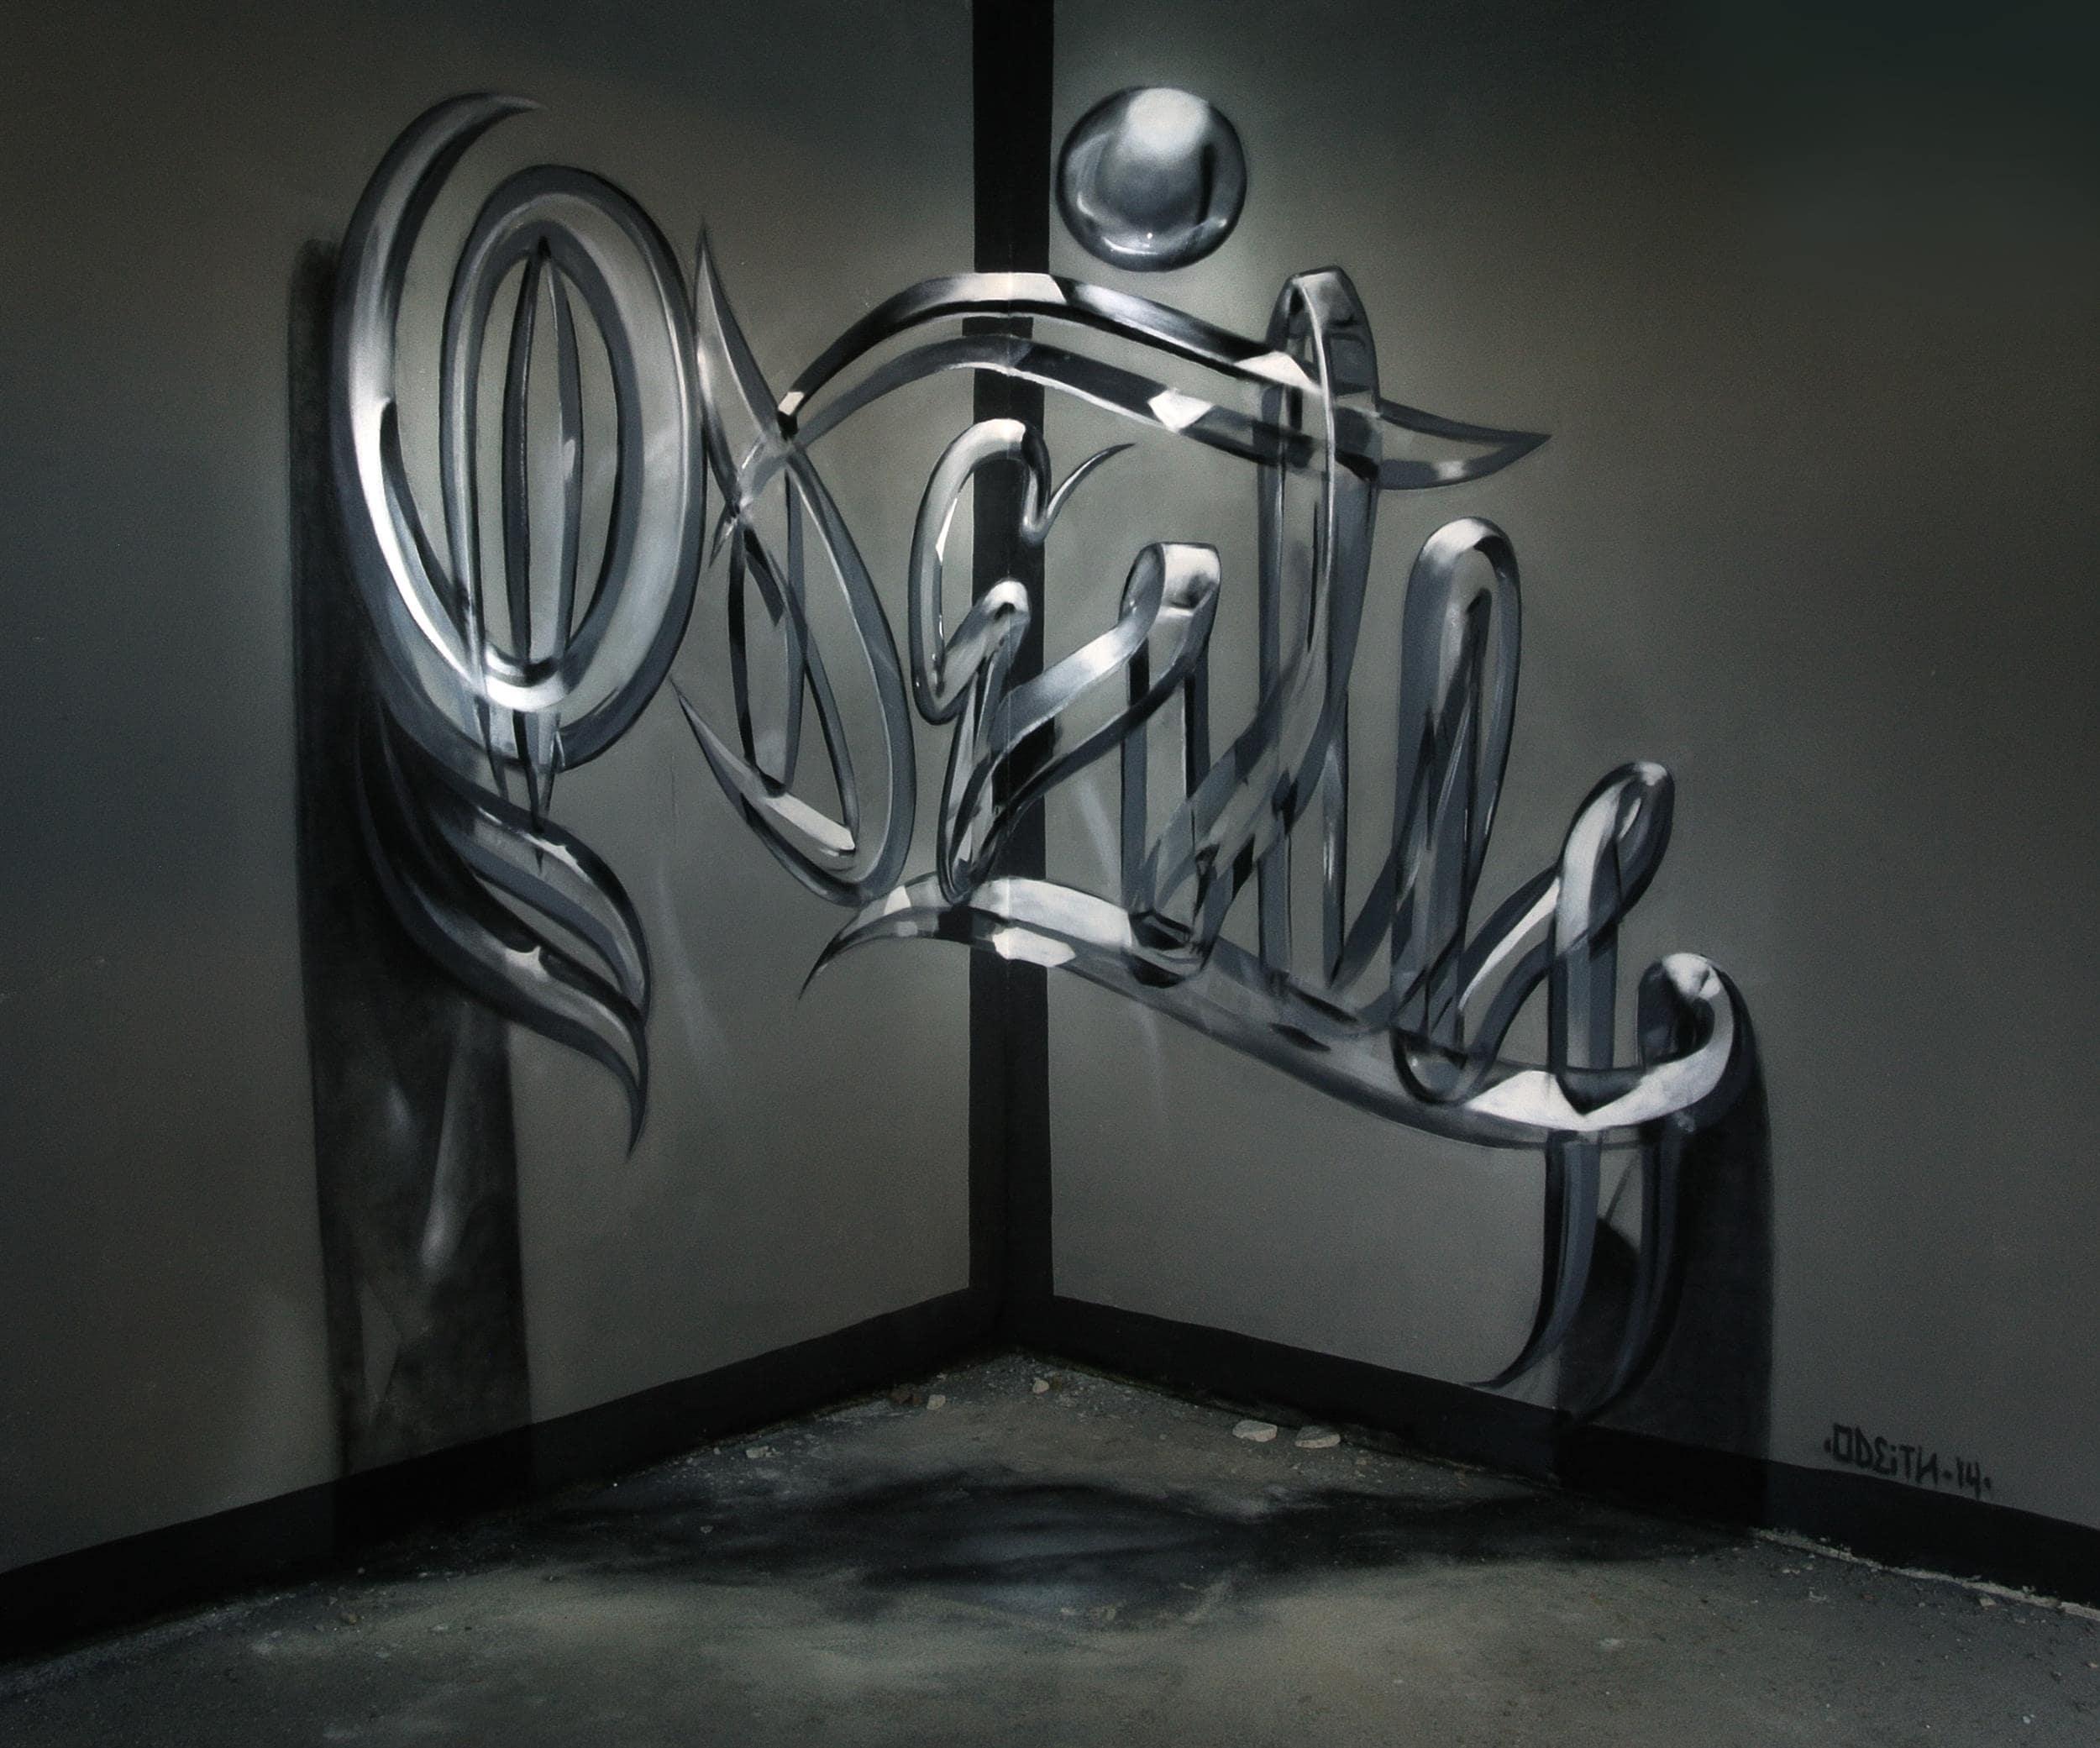 TILSITT GALLERY ODEITH Odeith Anamorphic graffiti letters Glossy glass effect-min